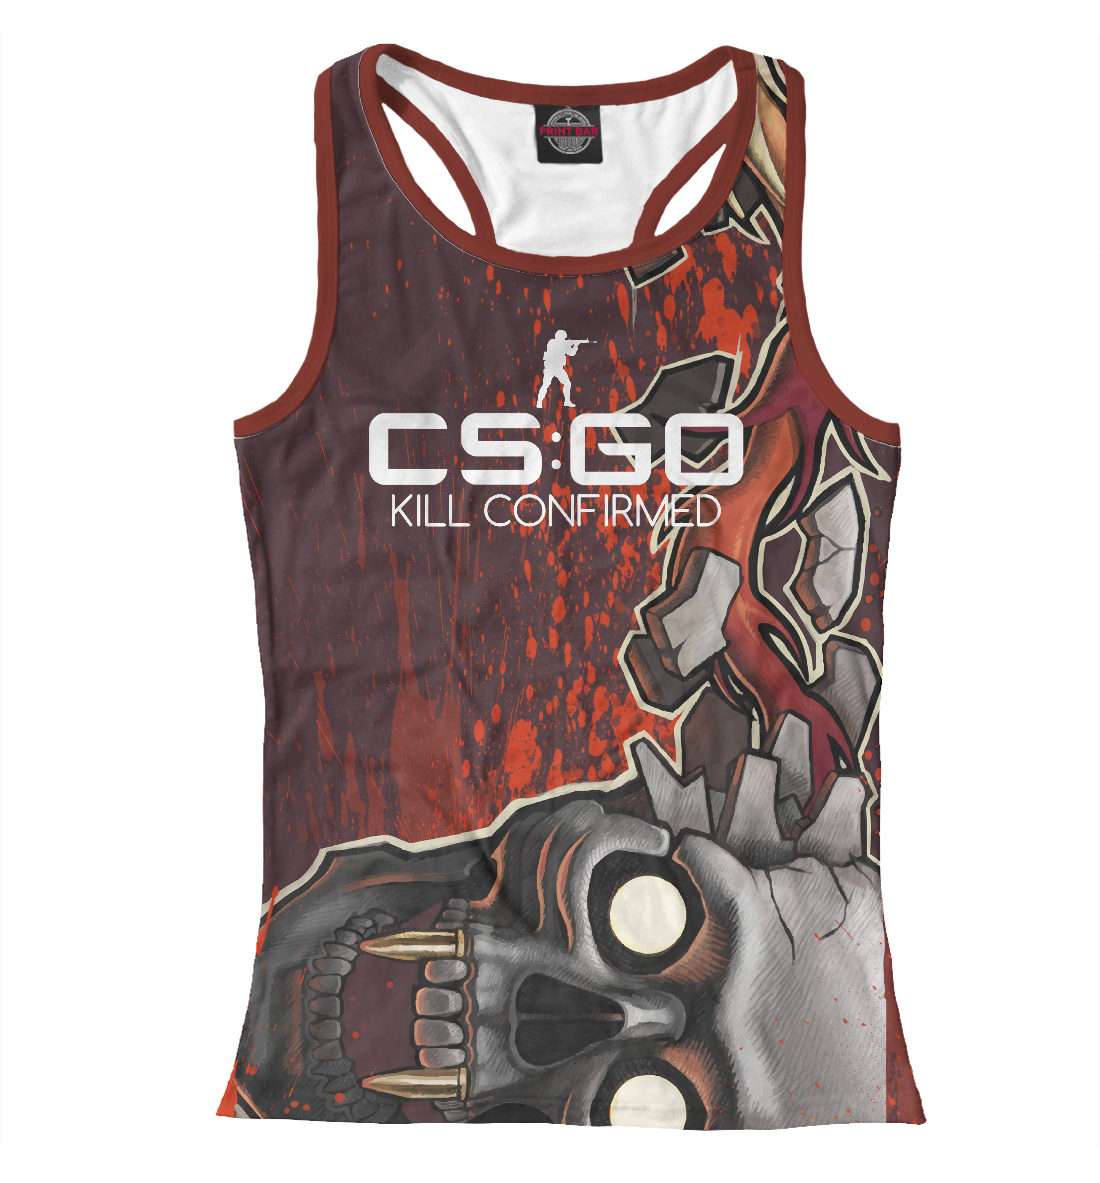 Купить CS:GO / Kill Confirmed, Printbar, Майки борцовки, COU-722117-mayb-1